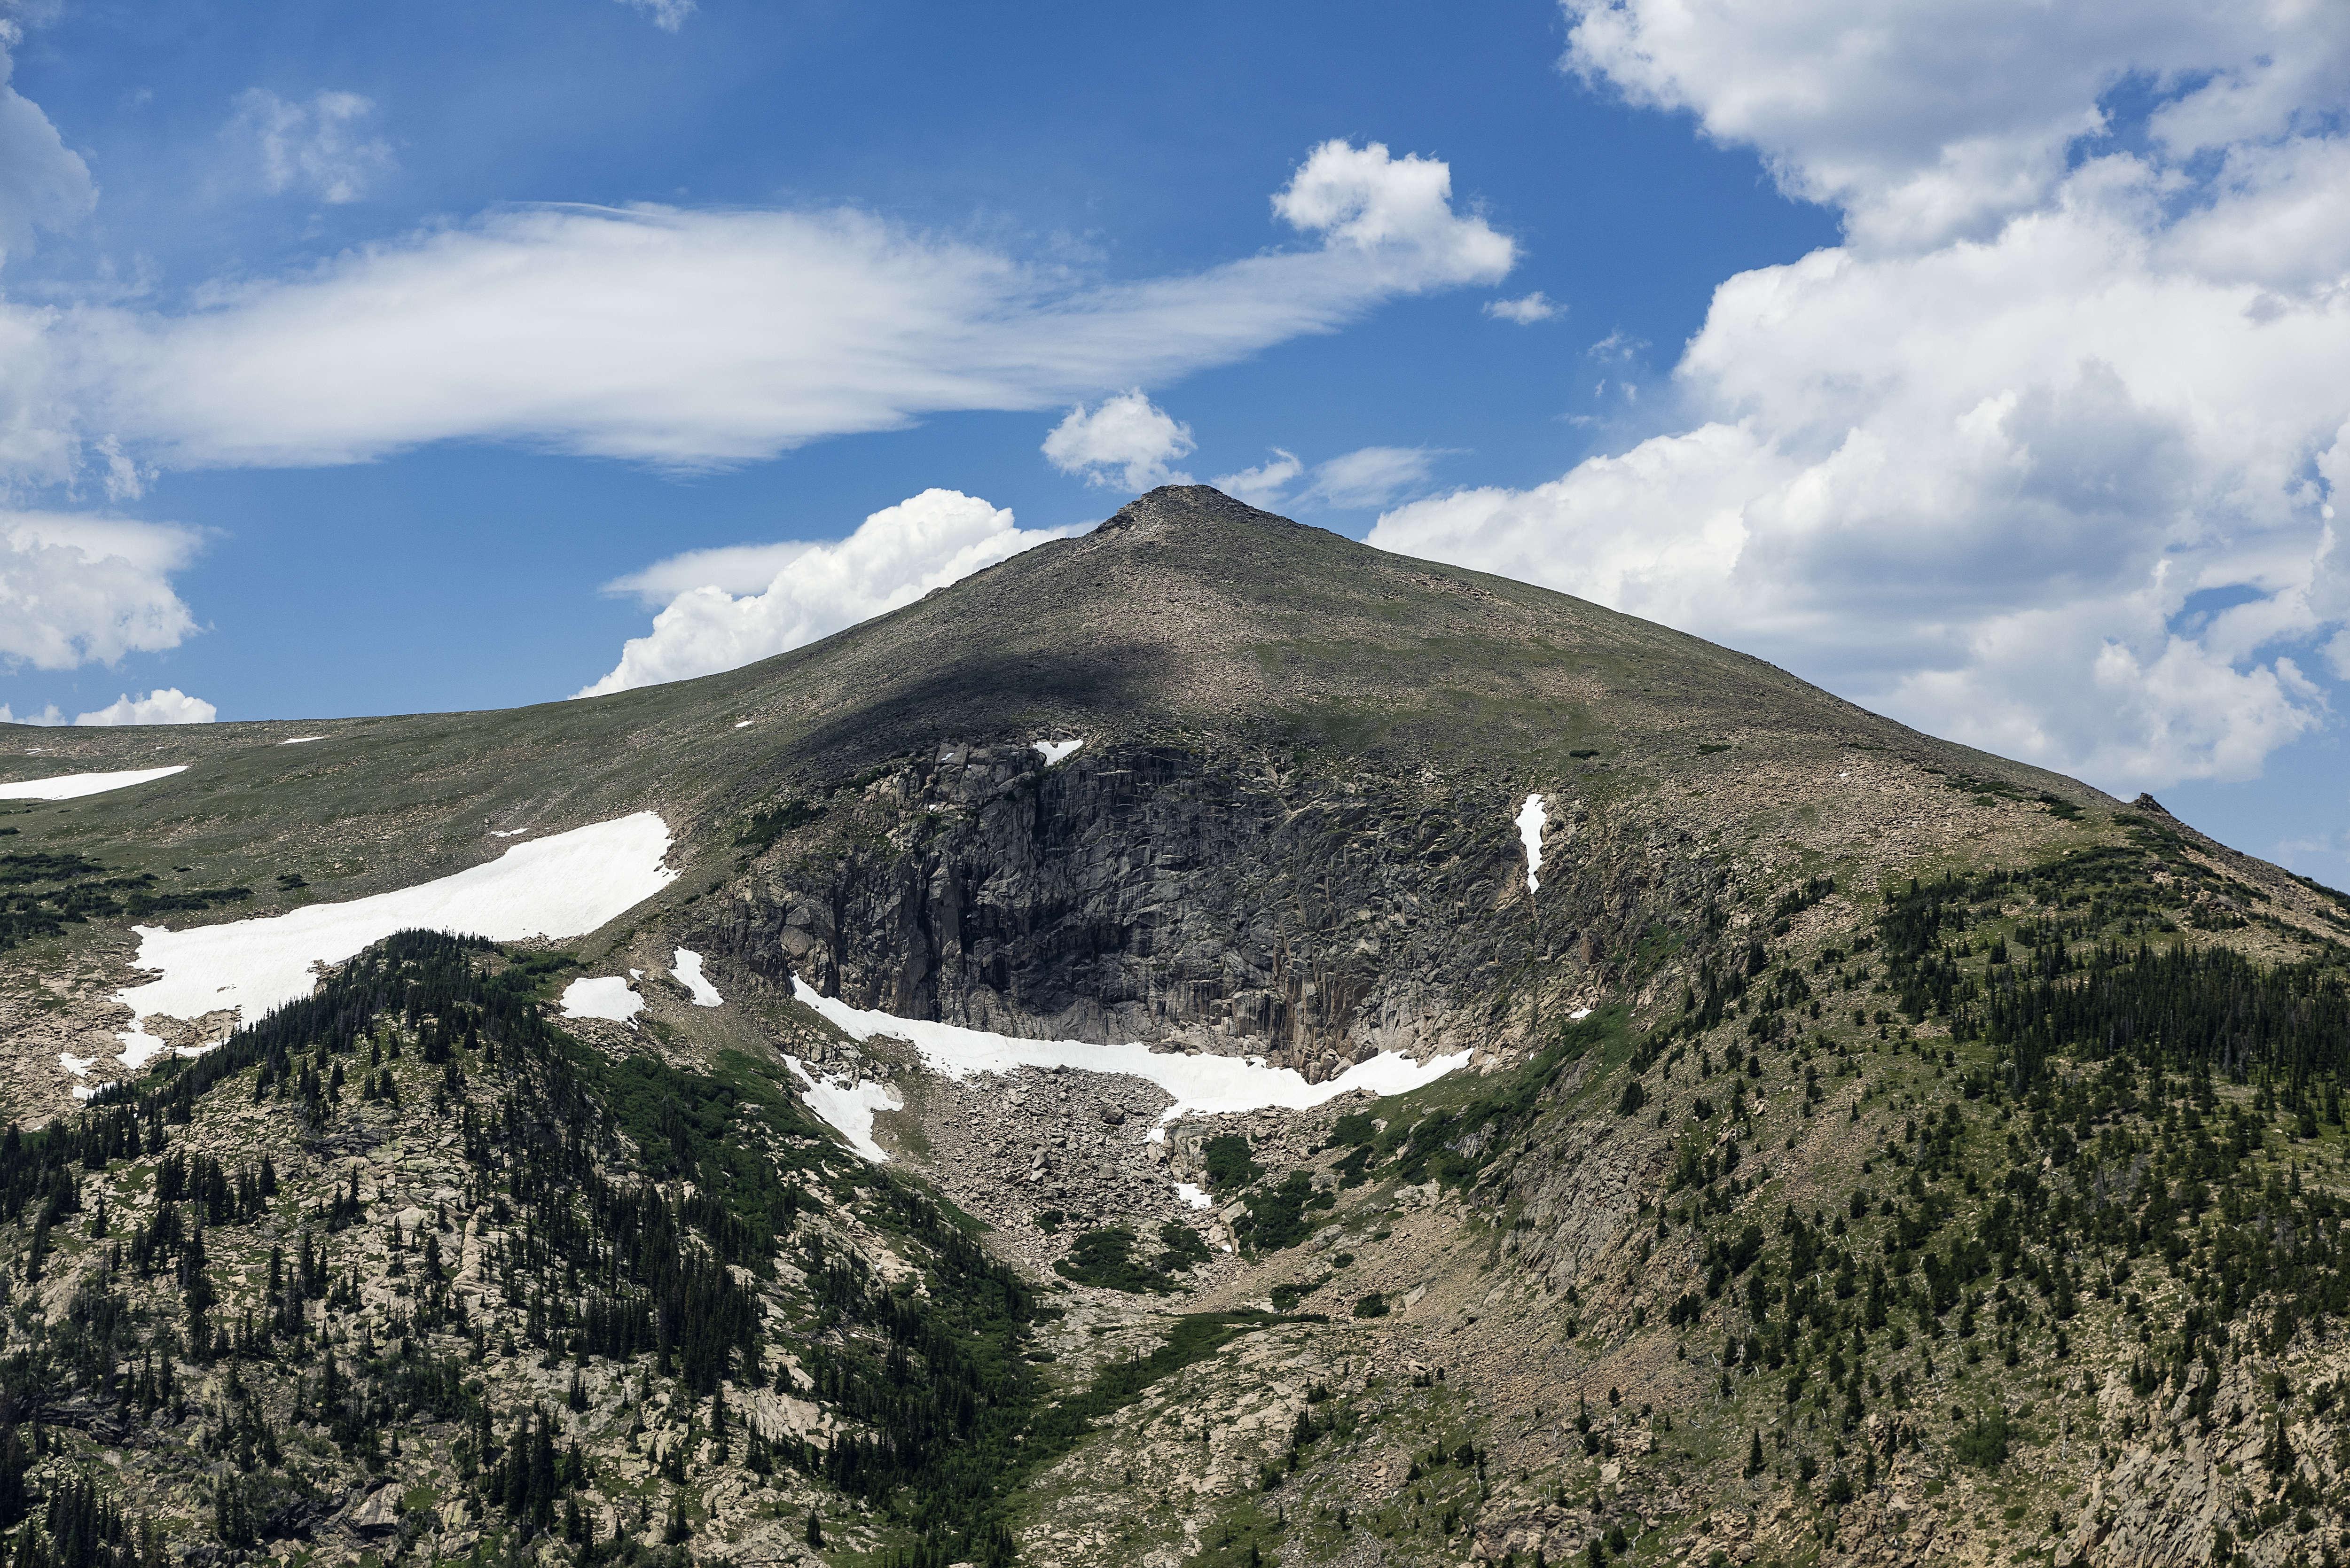 ESTES PARK, COLORADO, UNITED STATES - 2016/07/17: Mountain peak in Rocky Mountain National Park. (Photo by John Greim/LightRocket via Getty Images)